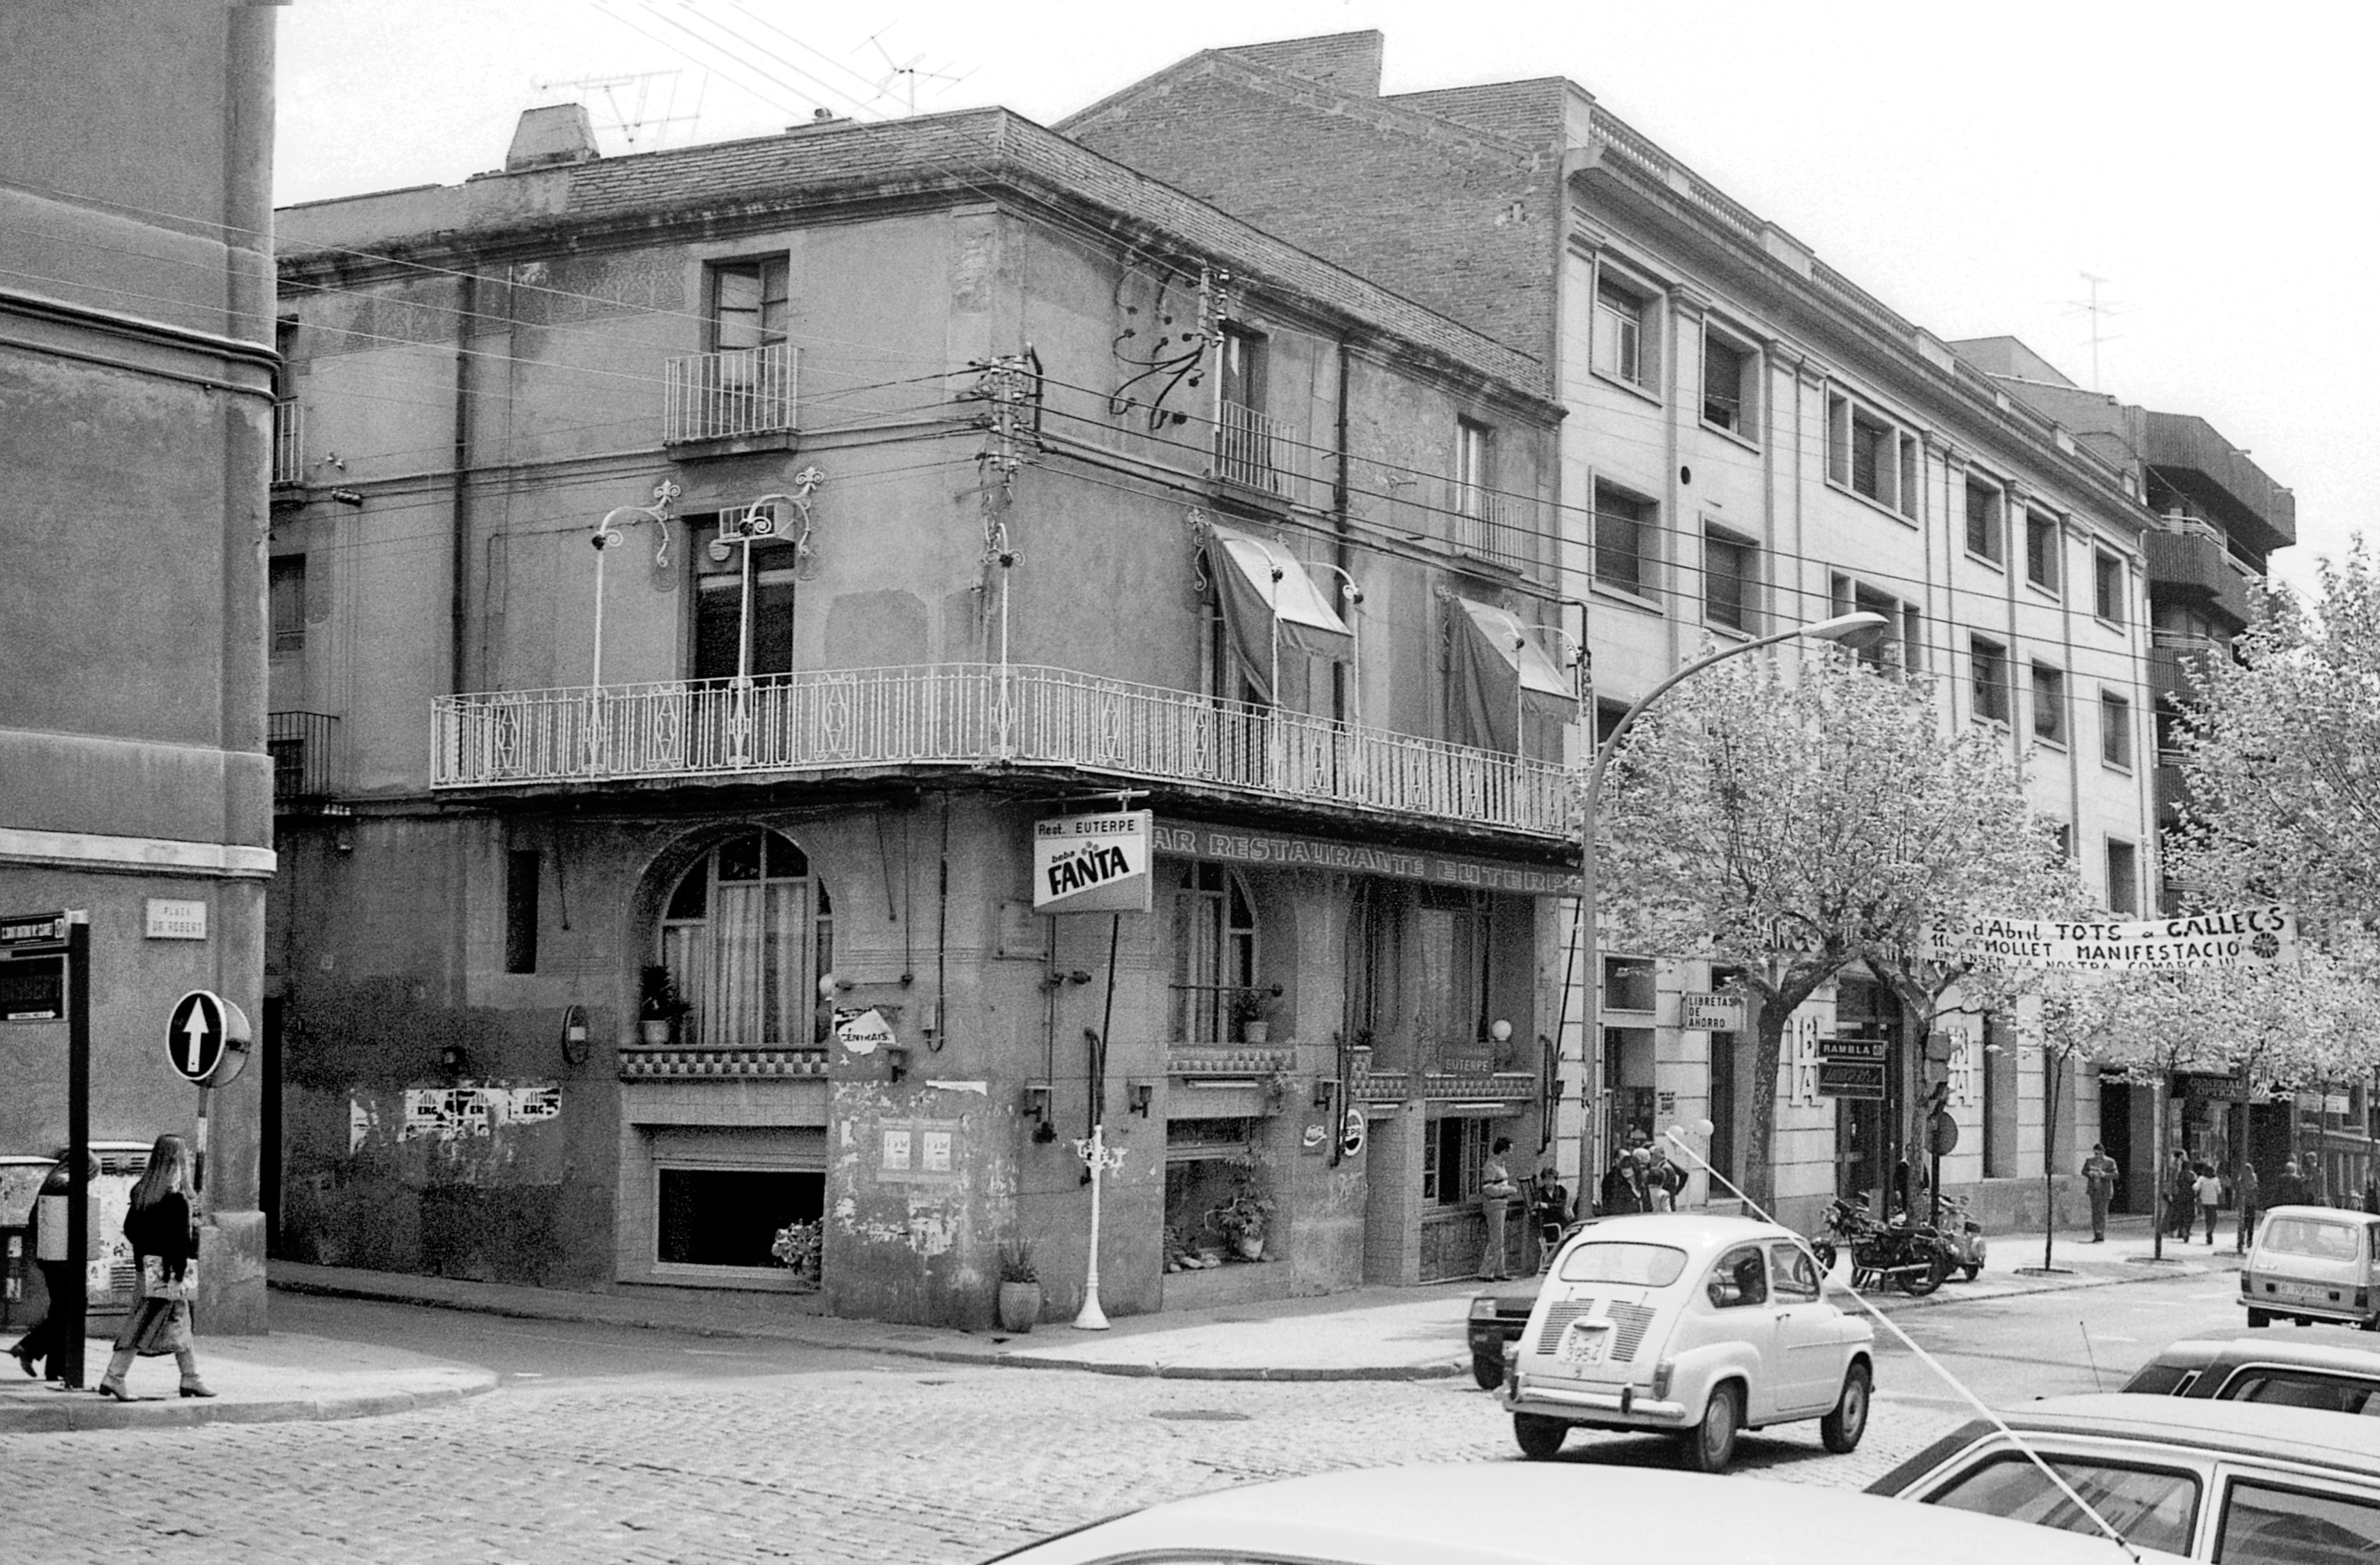 6 - 18362 Euterpe 1980 BIS